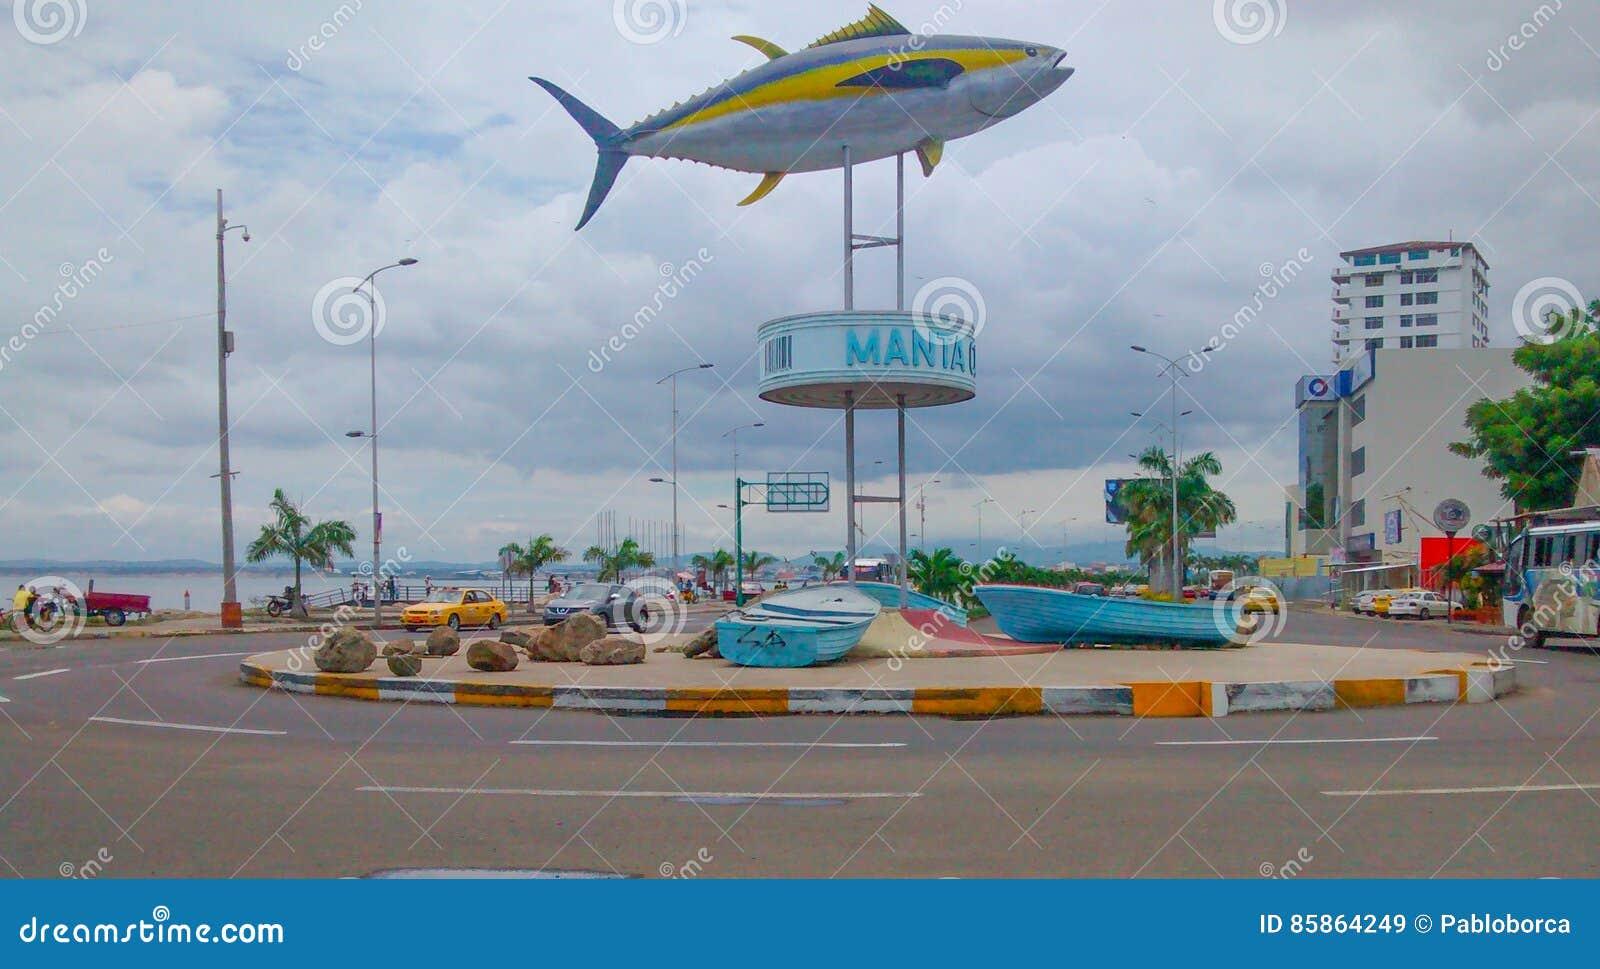 Tuna Monument In Manta, Ecuador Stock Image - Image of